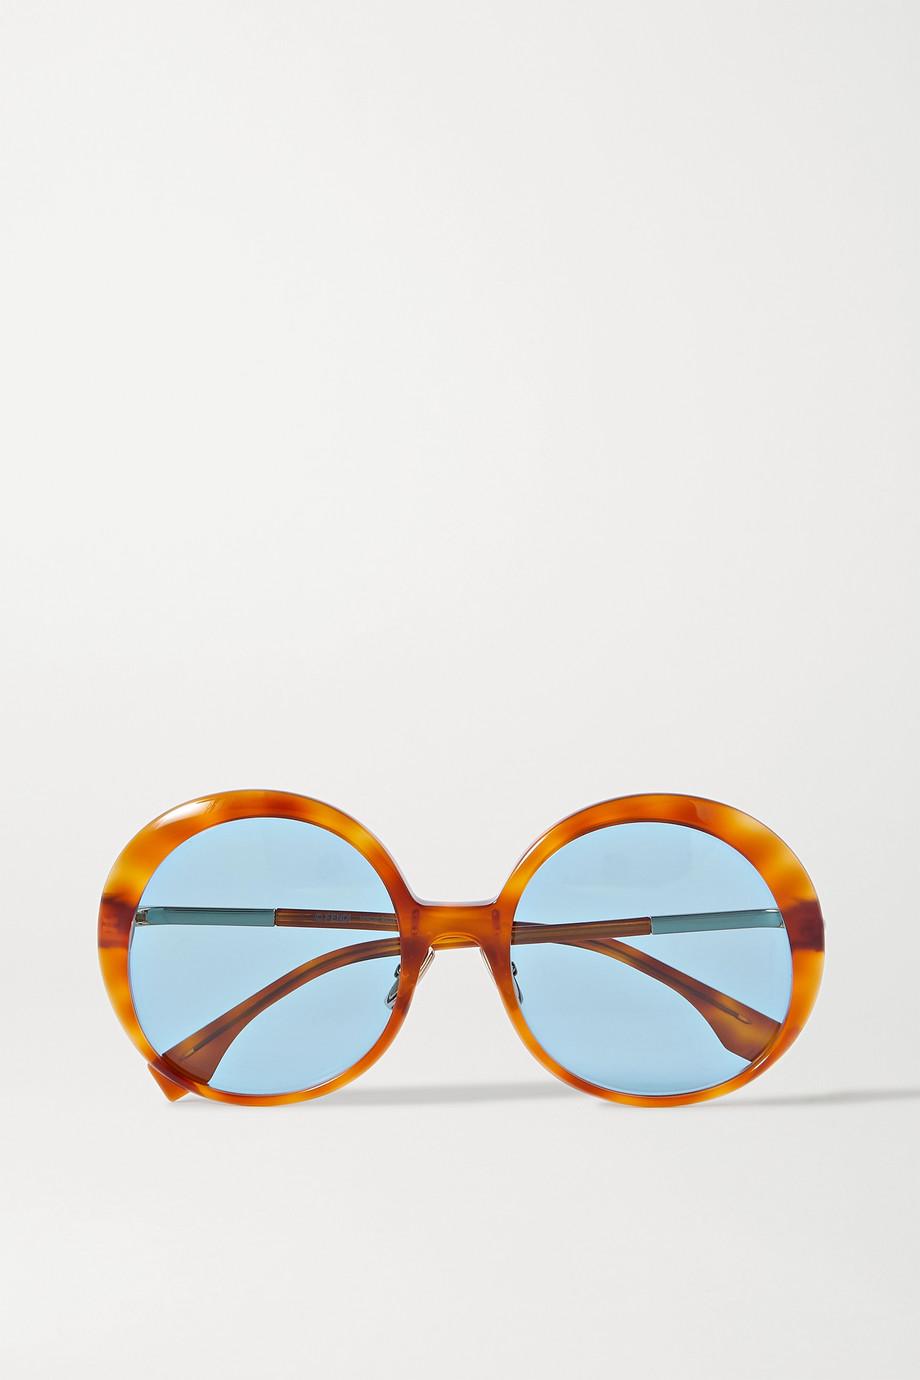 Fendi 玳瑁纹板材圆框太阳镜